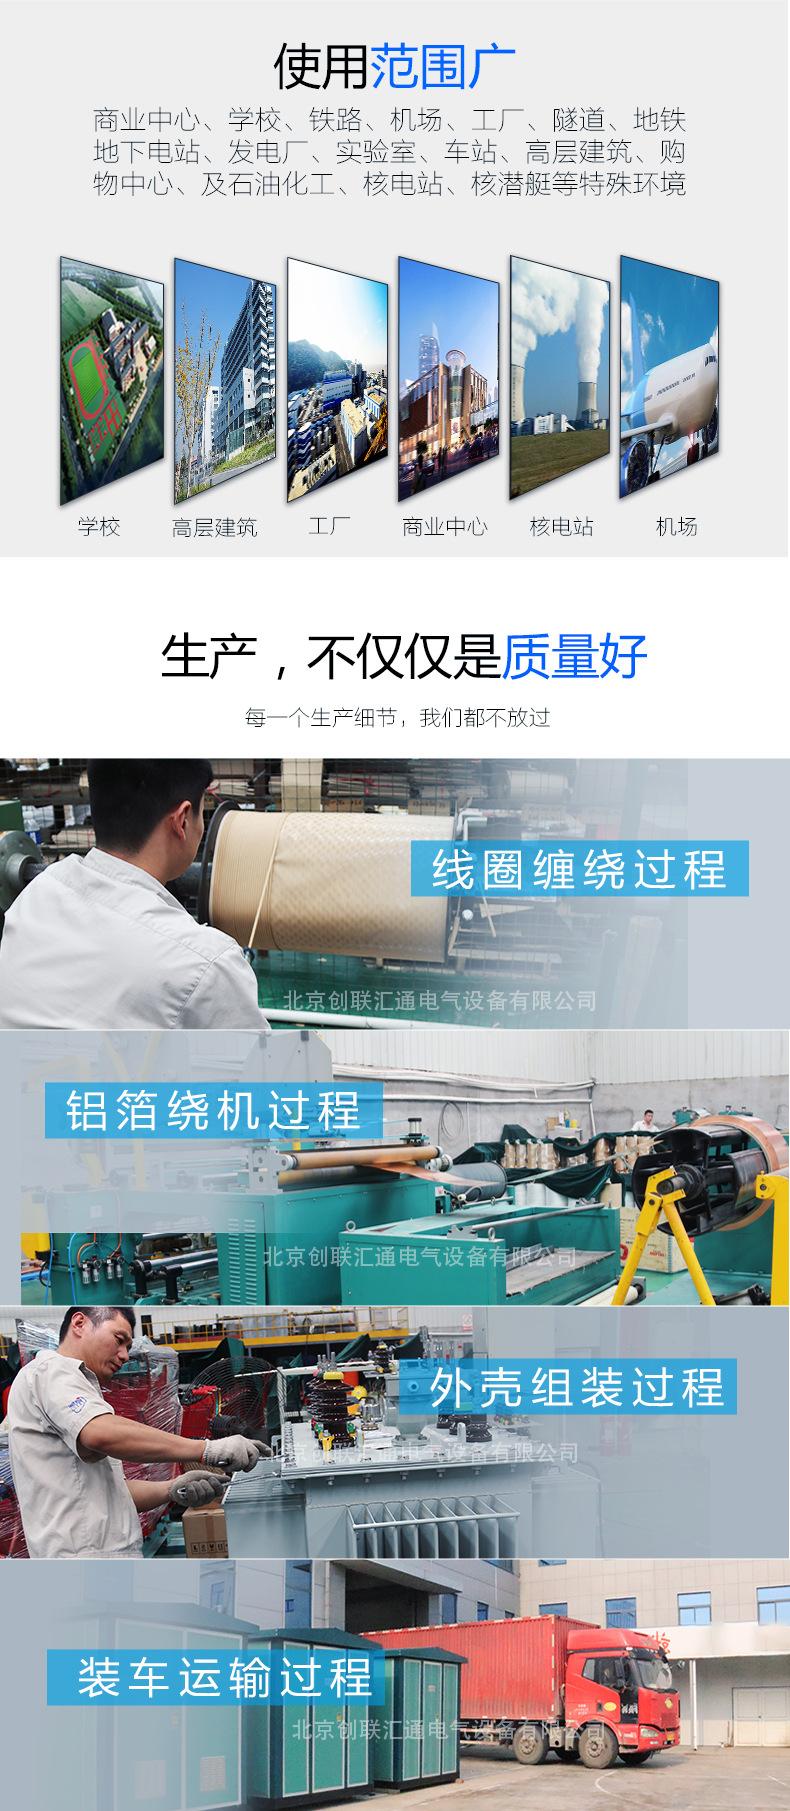 SH15型变压器 非晶合金油浸式变压器 变压器厂家 厂价直销 品质保-创联汇通示例图6